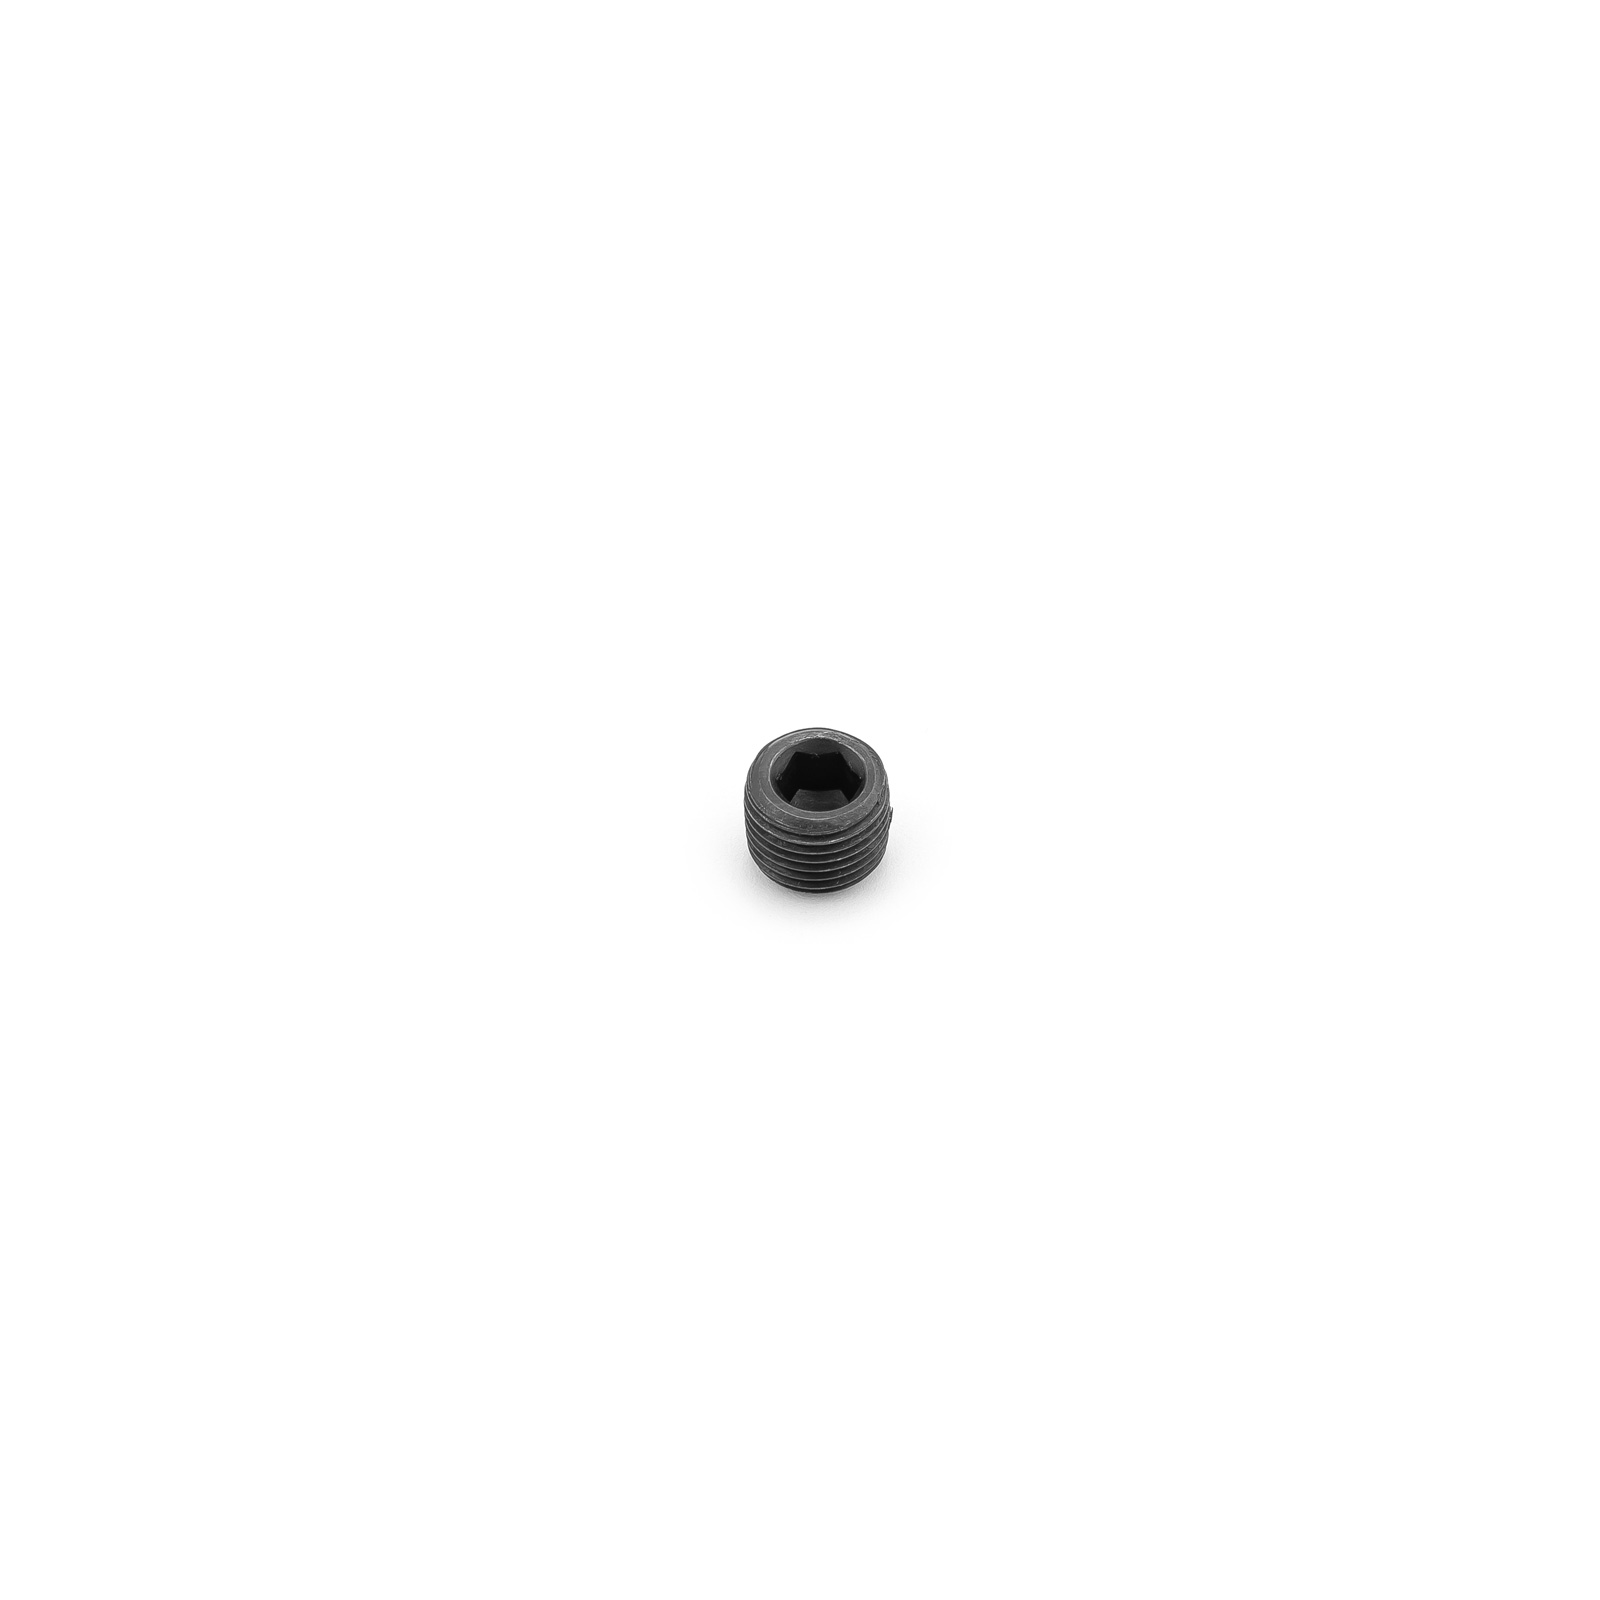 "Internal Allen Head Pipe Plug Fitting 3/8"" NPT Black Anodized"